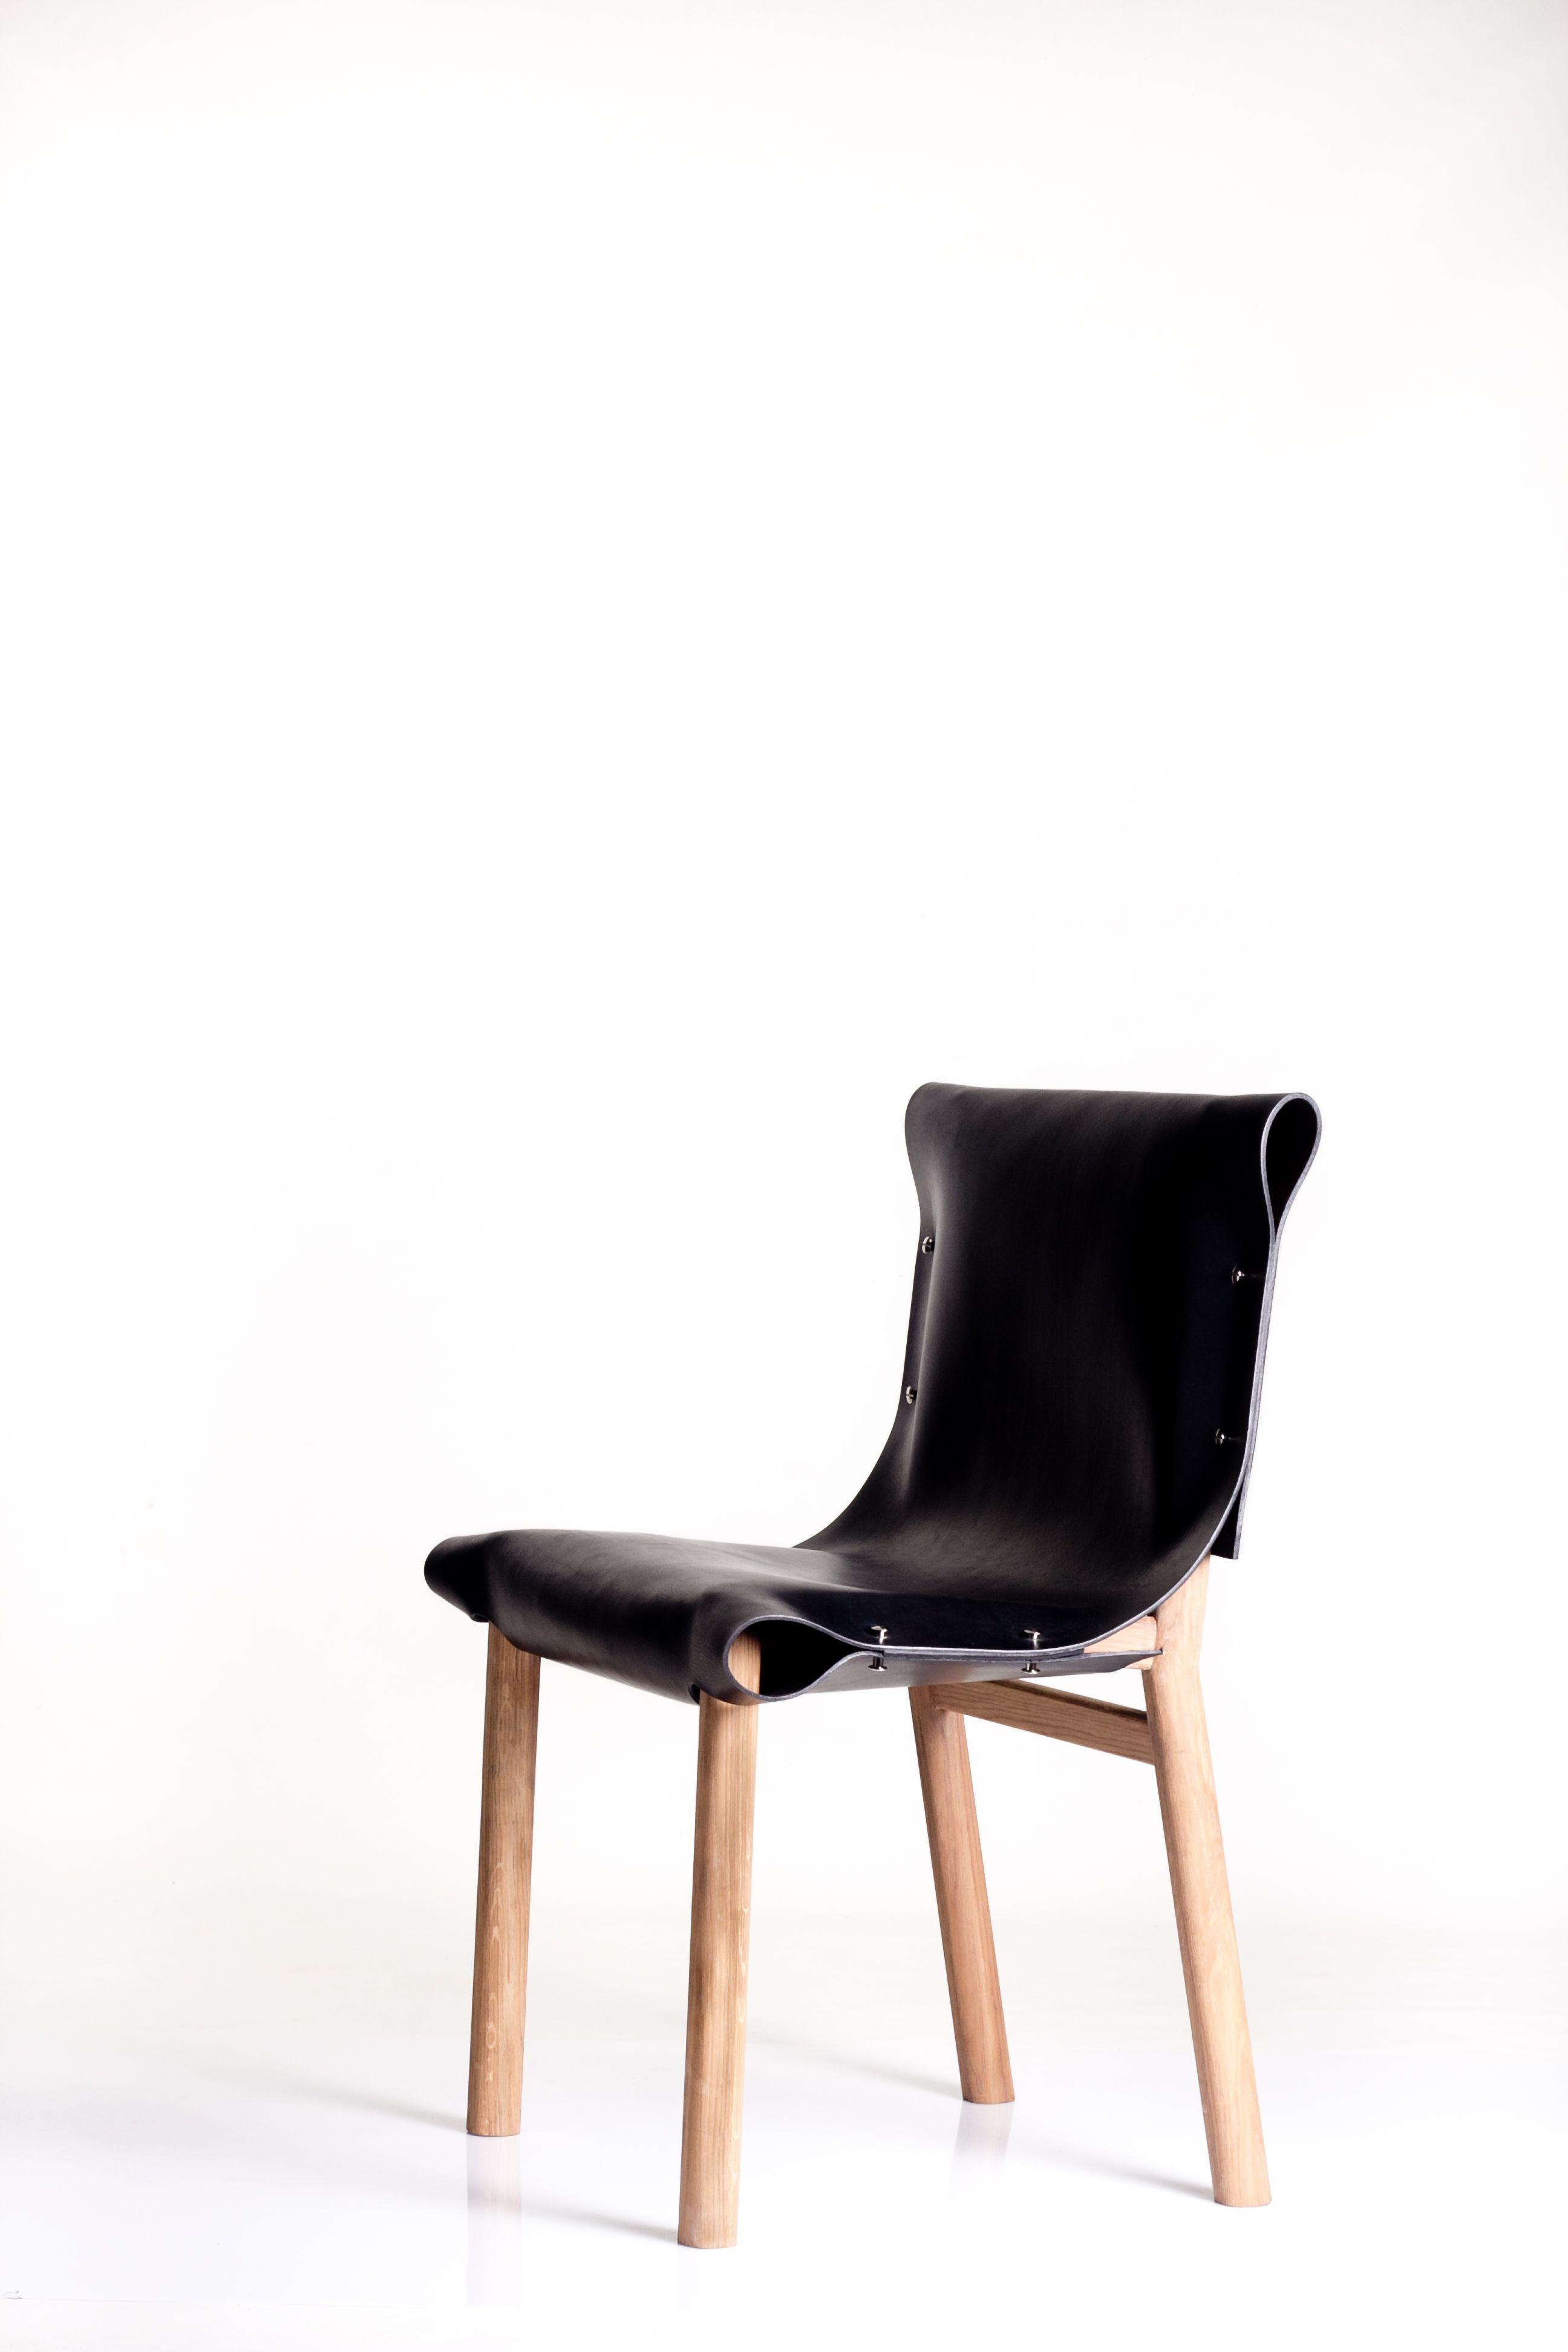 wrap by carmen van bel pull up a chair pinterest diy rh pinterest com